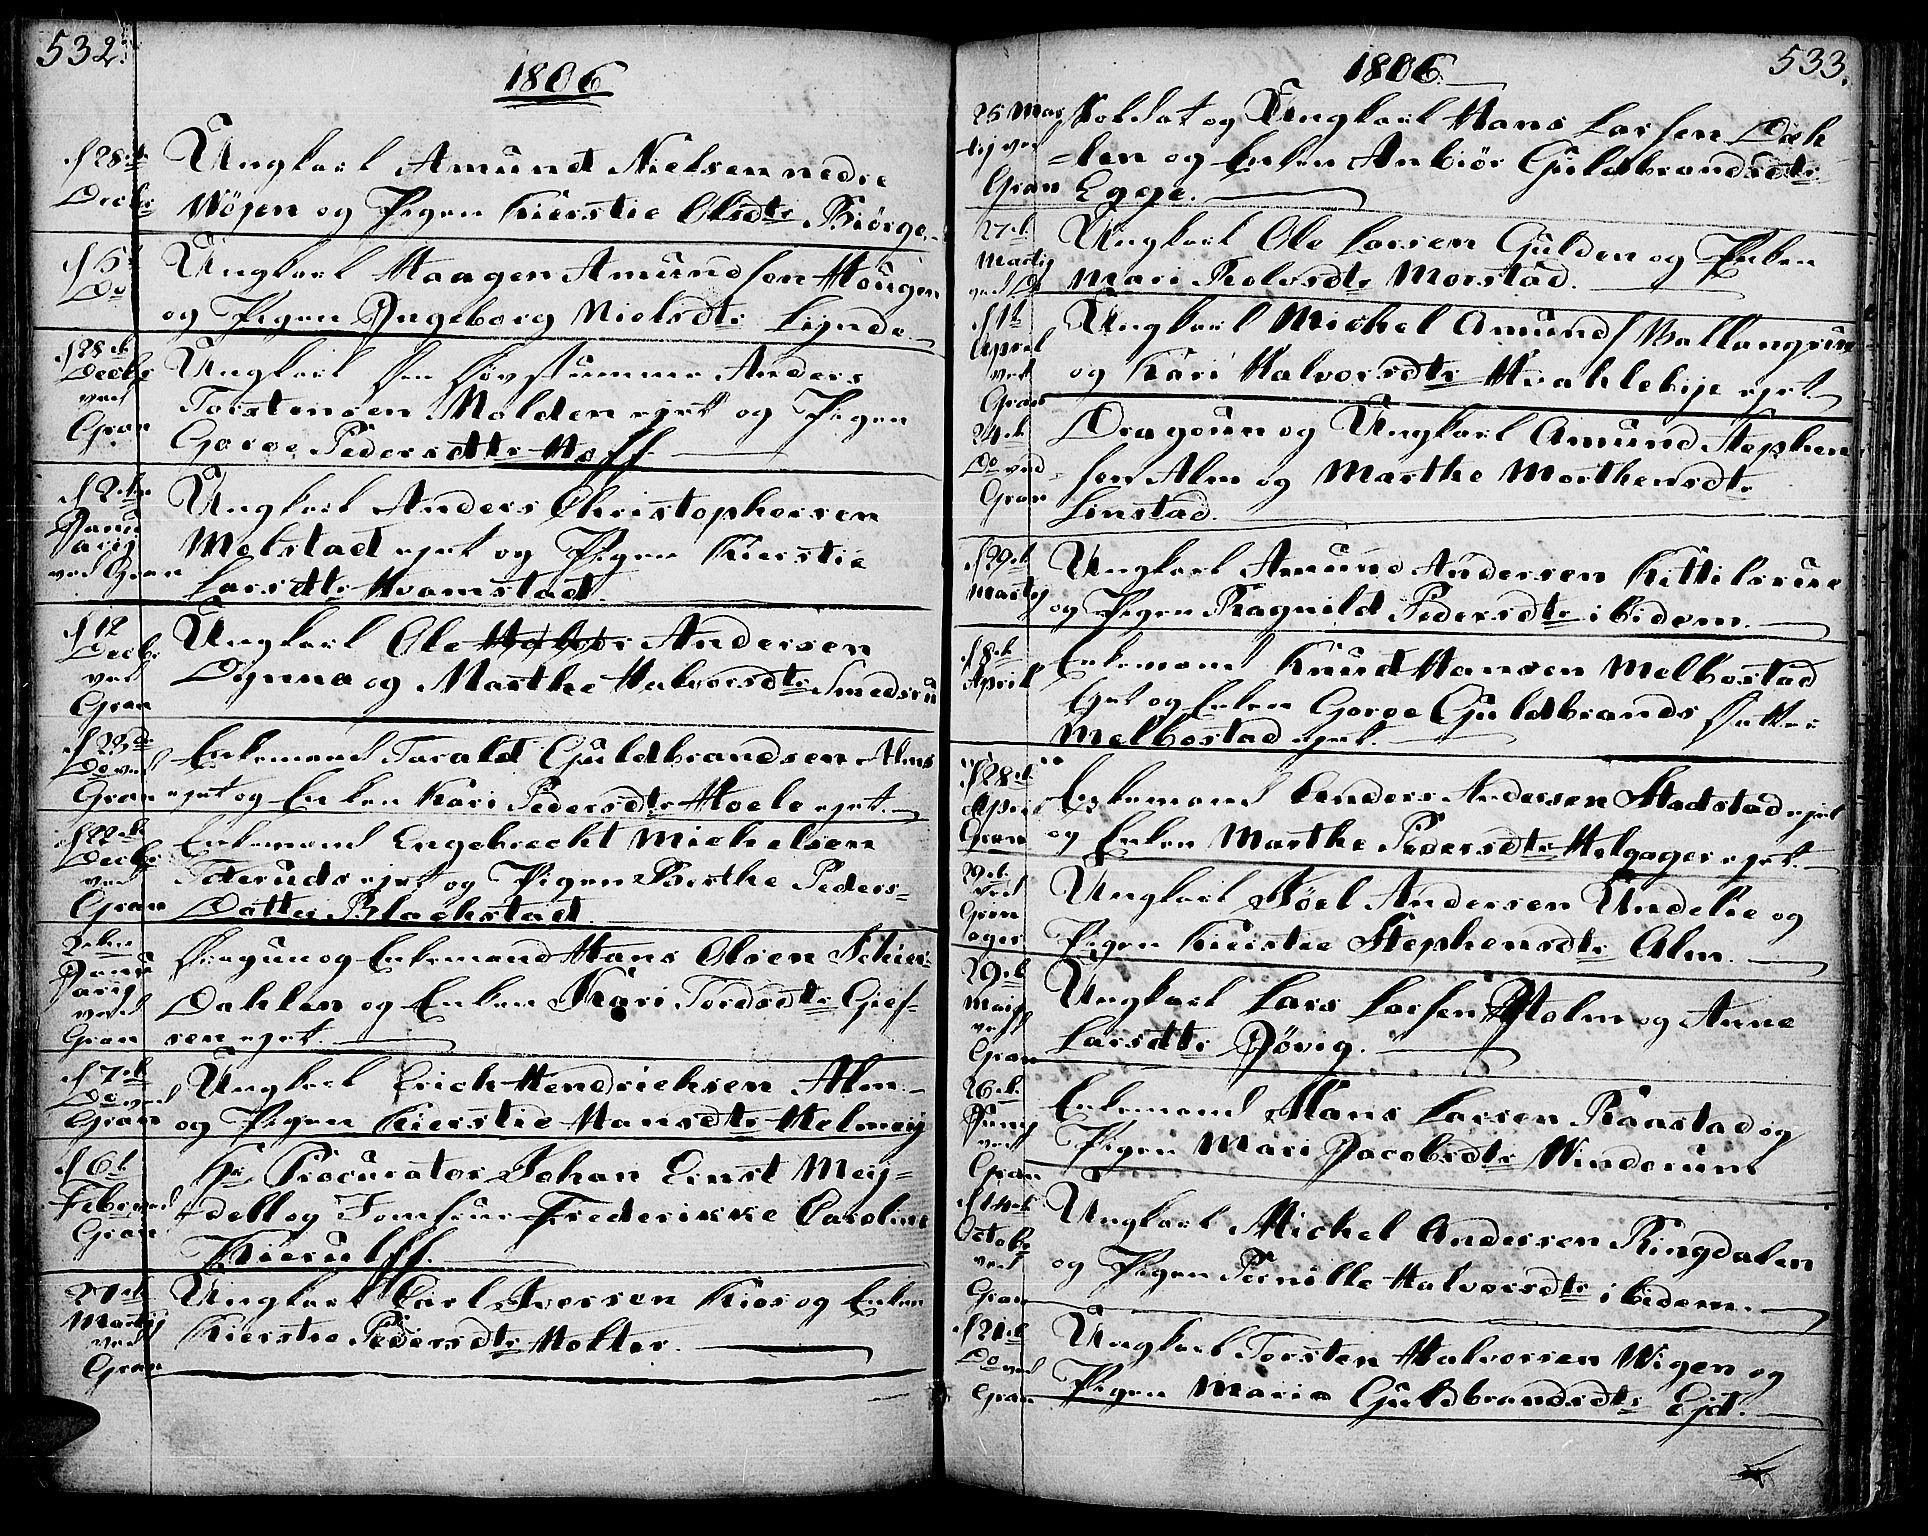 SAH, Gran prestekontor, Ministerialbok nr. 6, 1787-1824, s. 532-533